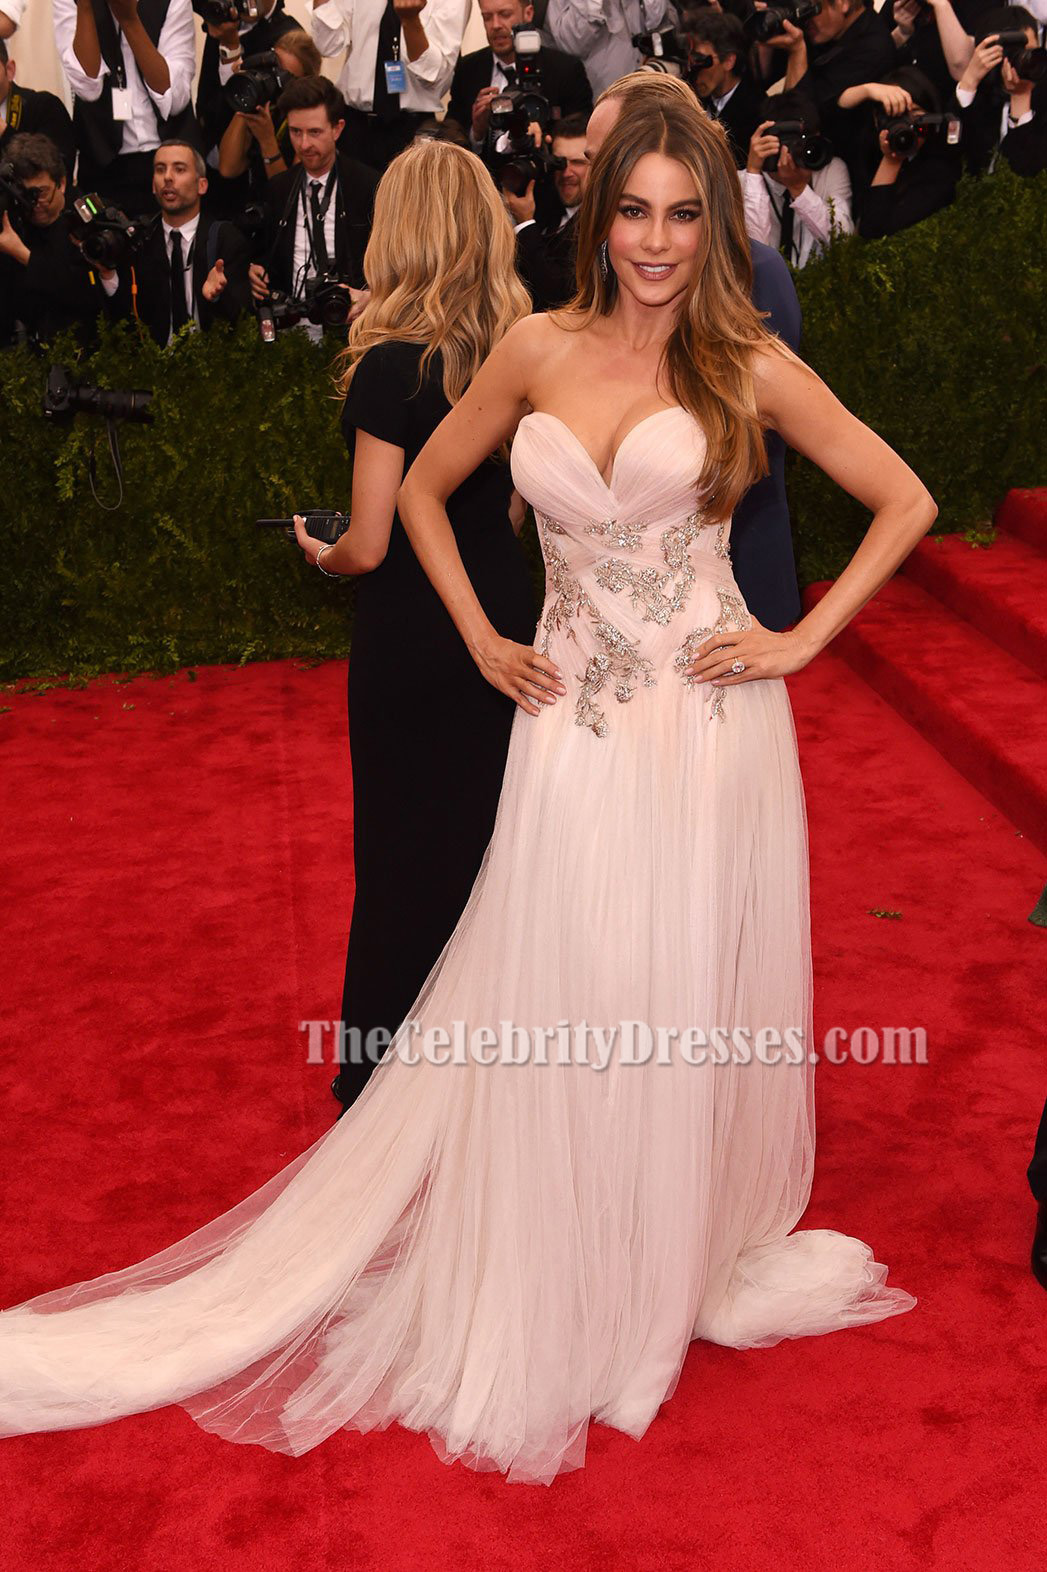 Sofia Vergara Tulle Strapless Formal Evening Dress 2015 Met Gala Red ...